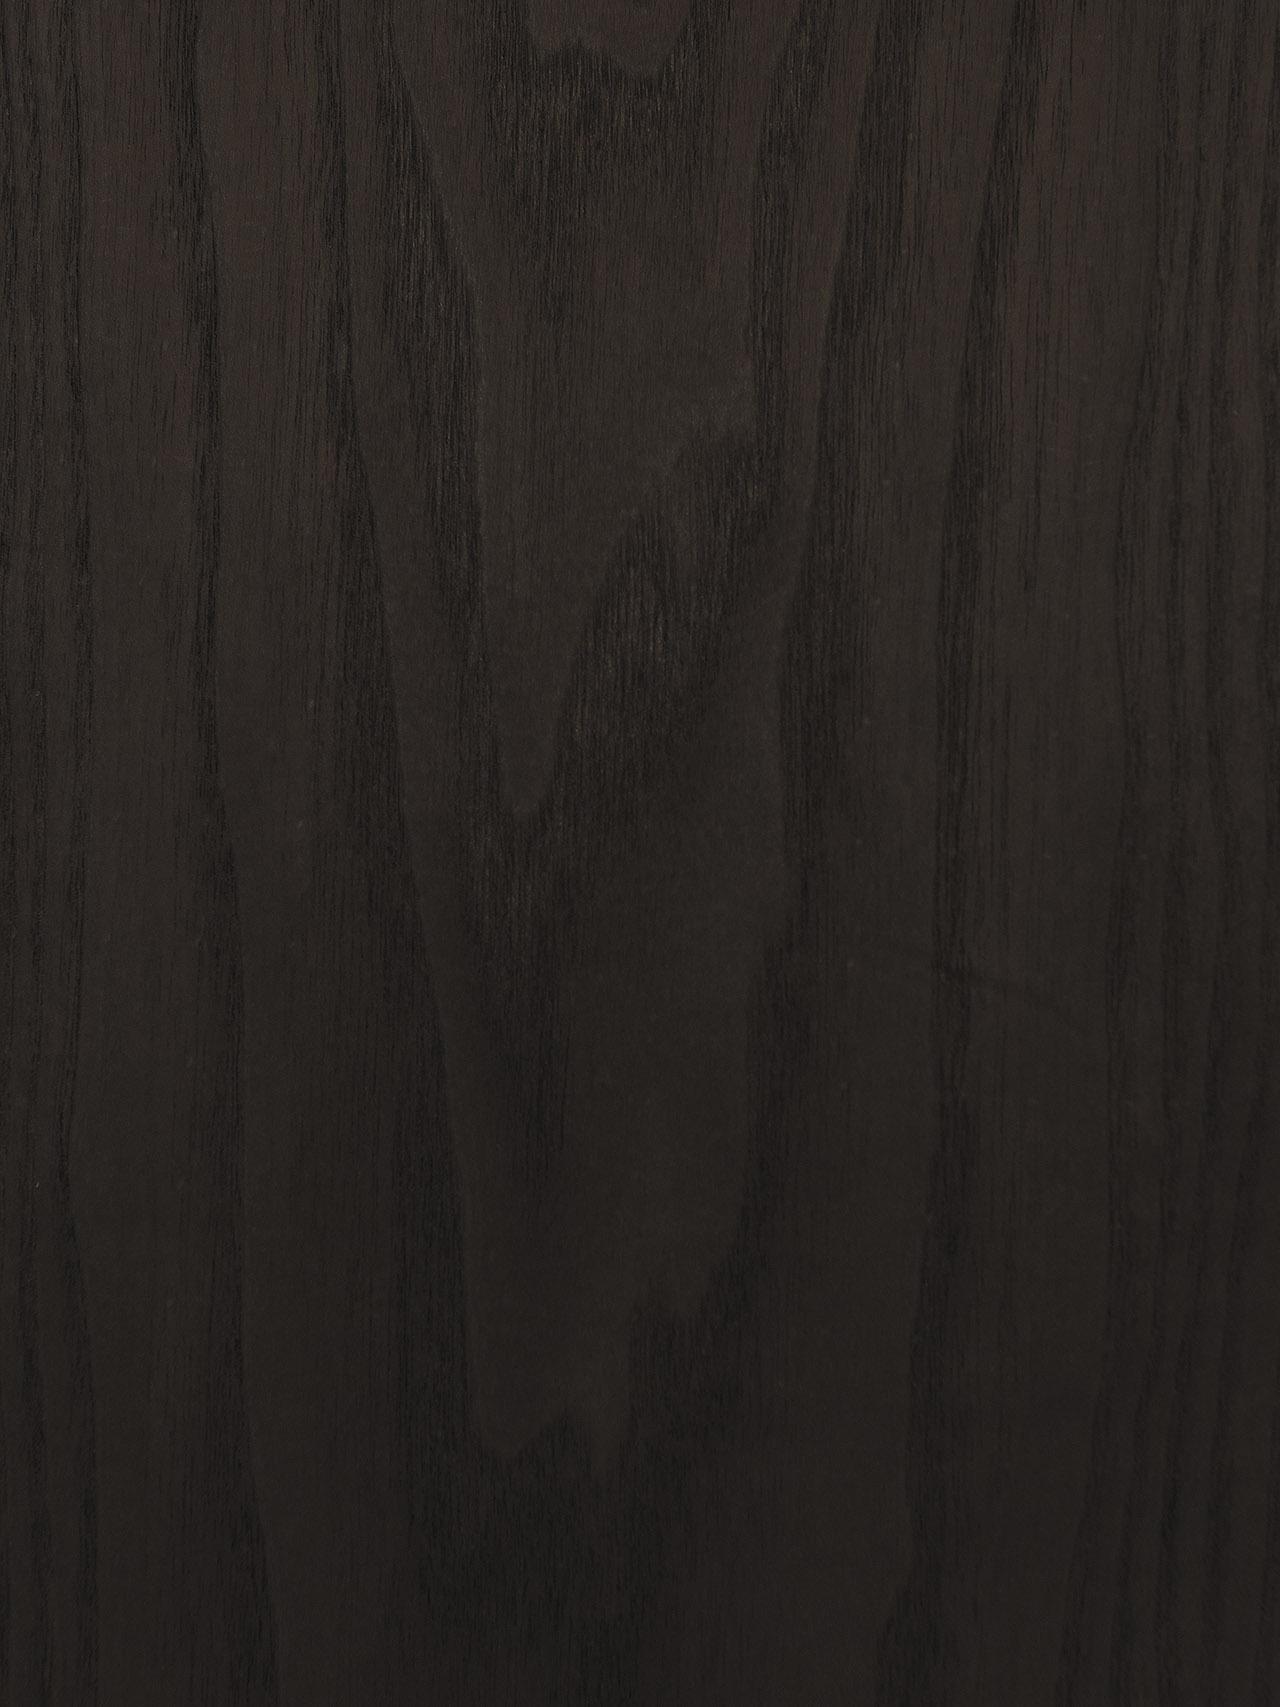 Panel Chapa Fresno Avellana Oscuro